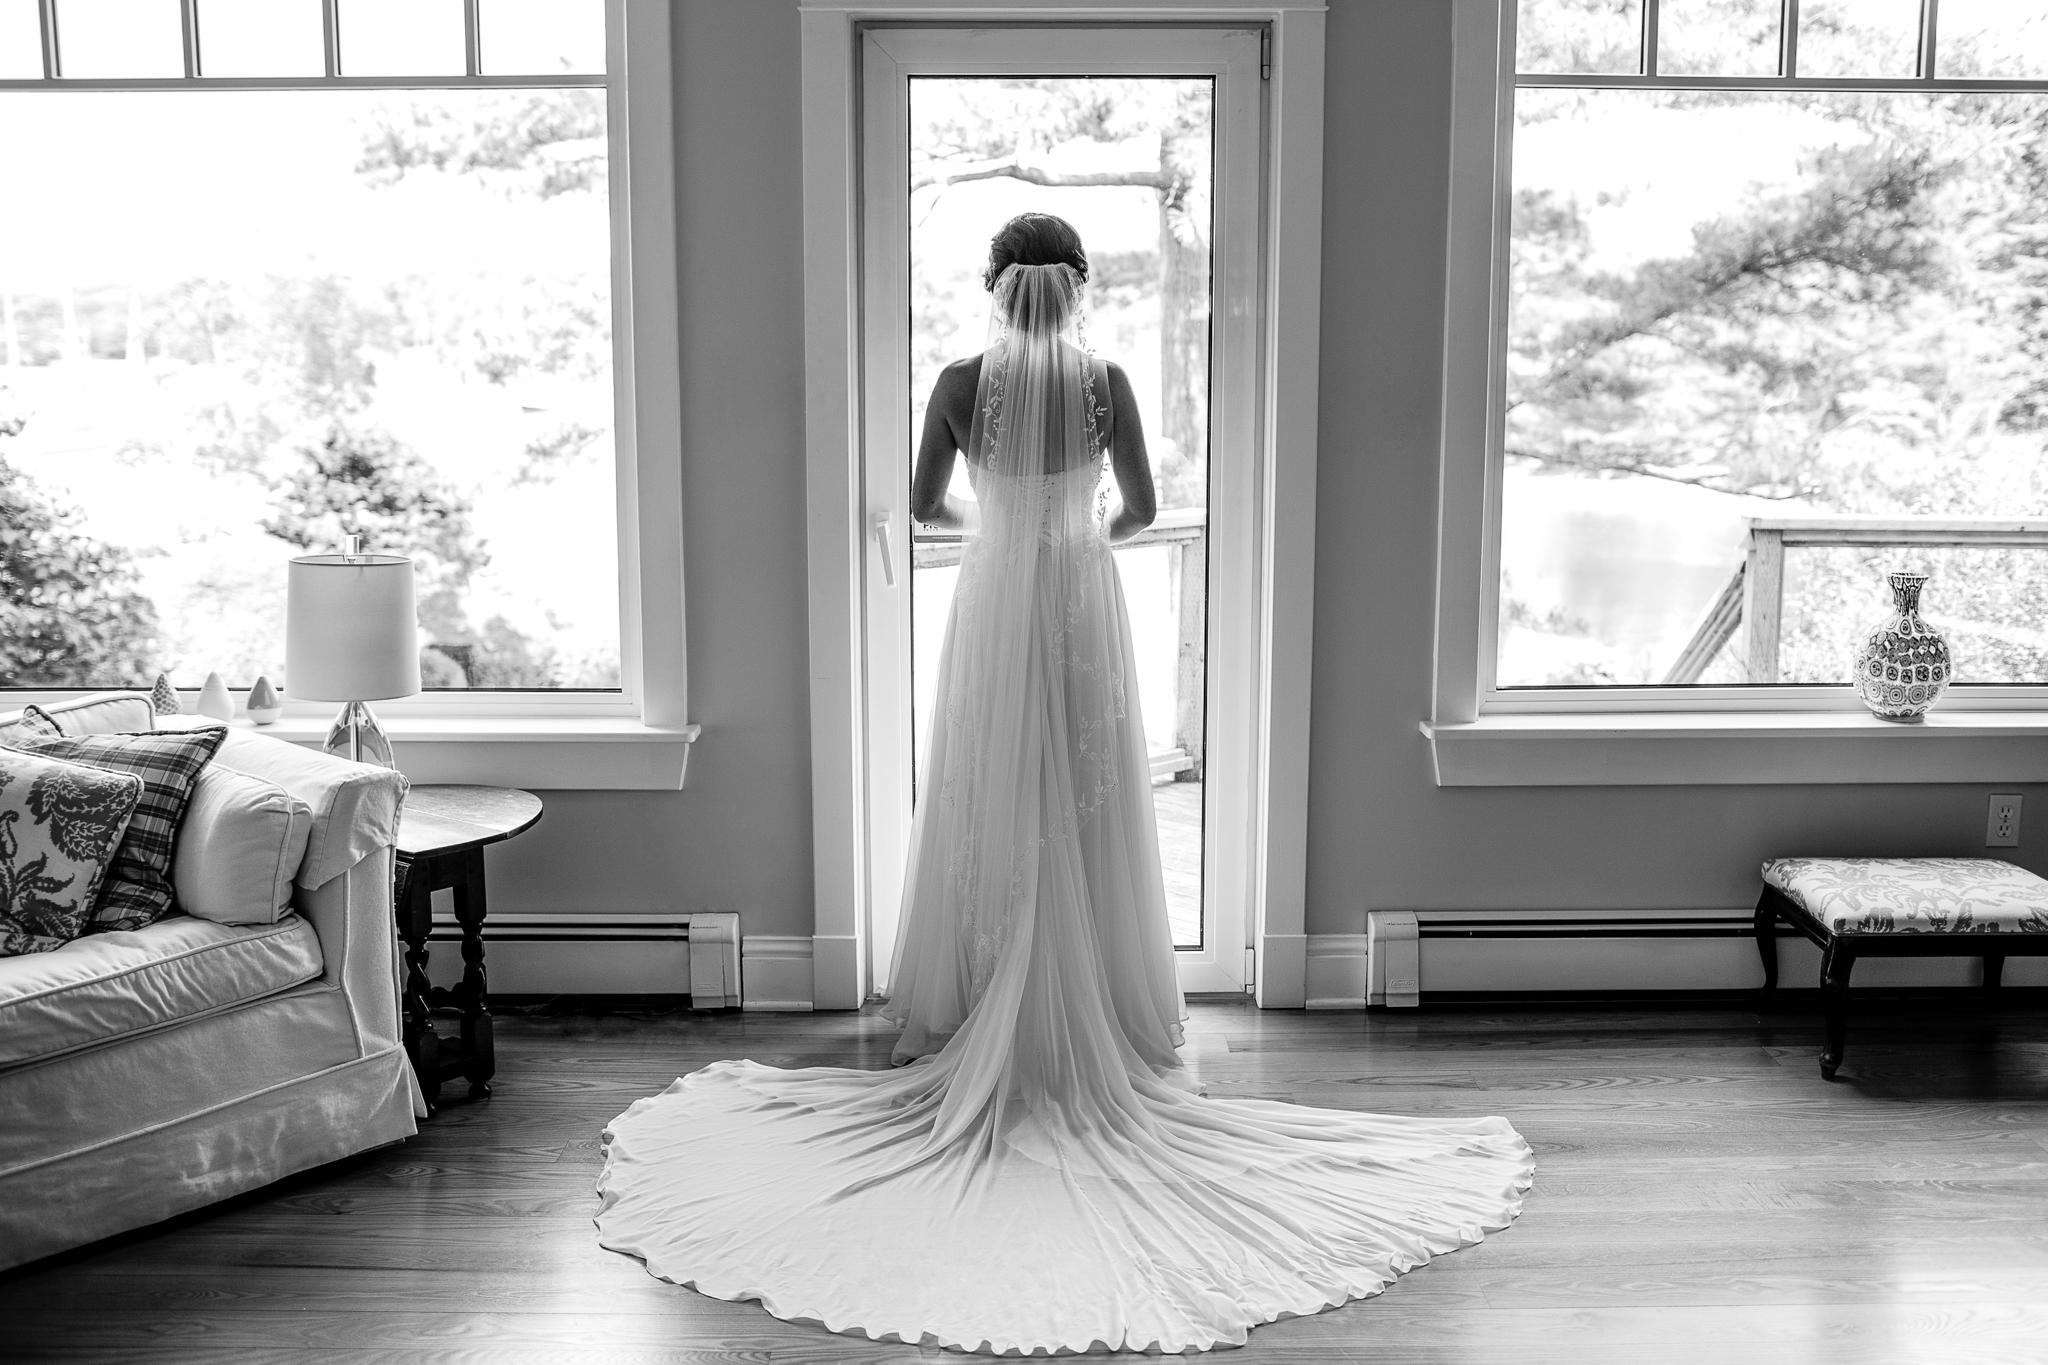 06-LORD-NELSON-WEDDING-VENUE-HALIFAX.jpg